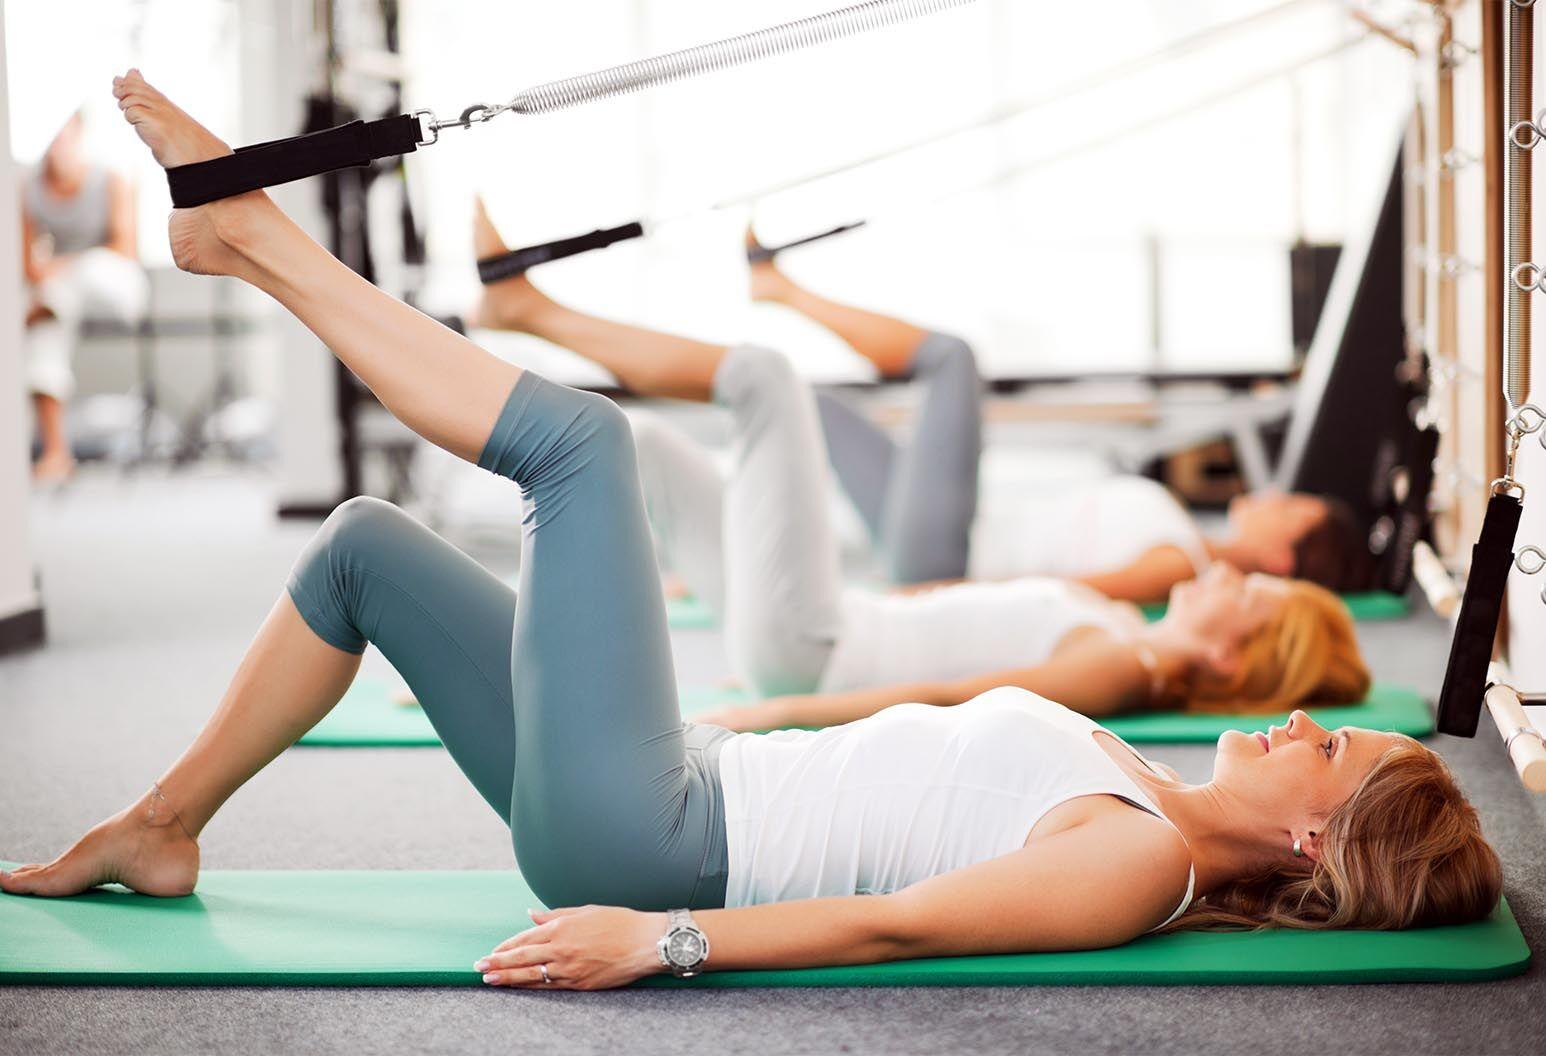 Women lying on the exercising mat and using Pilates machine.